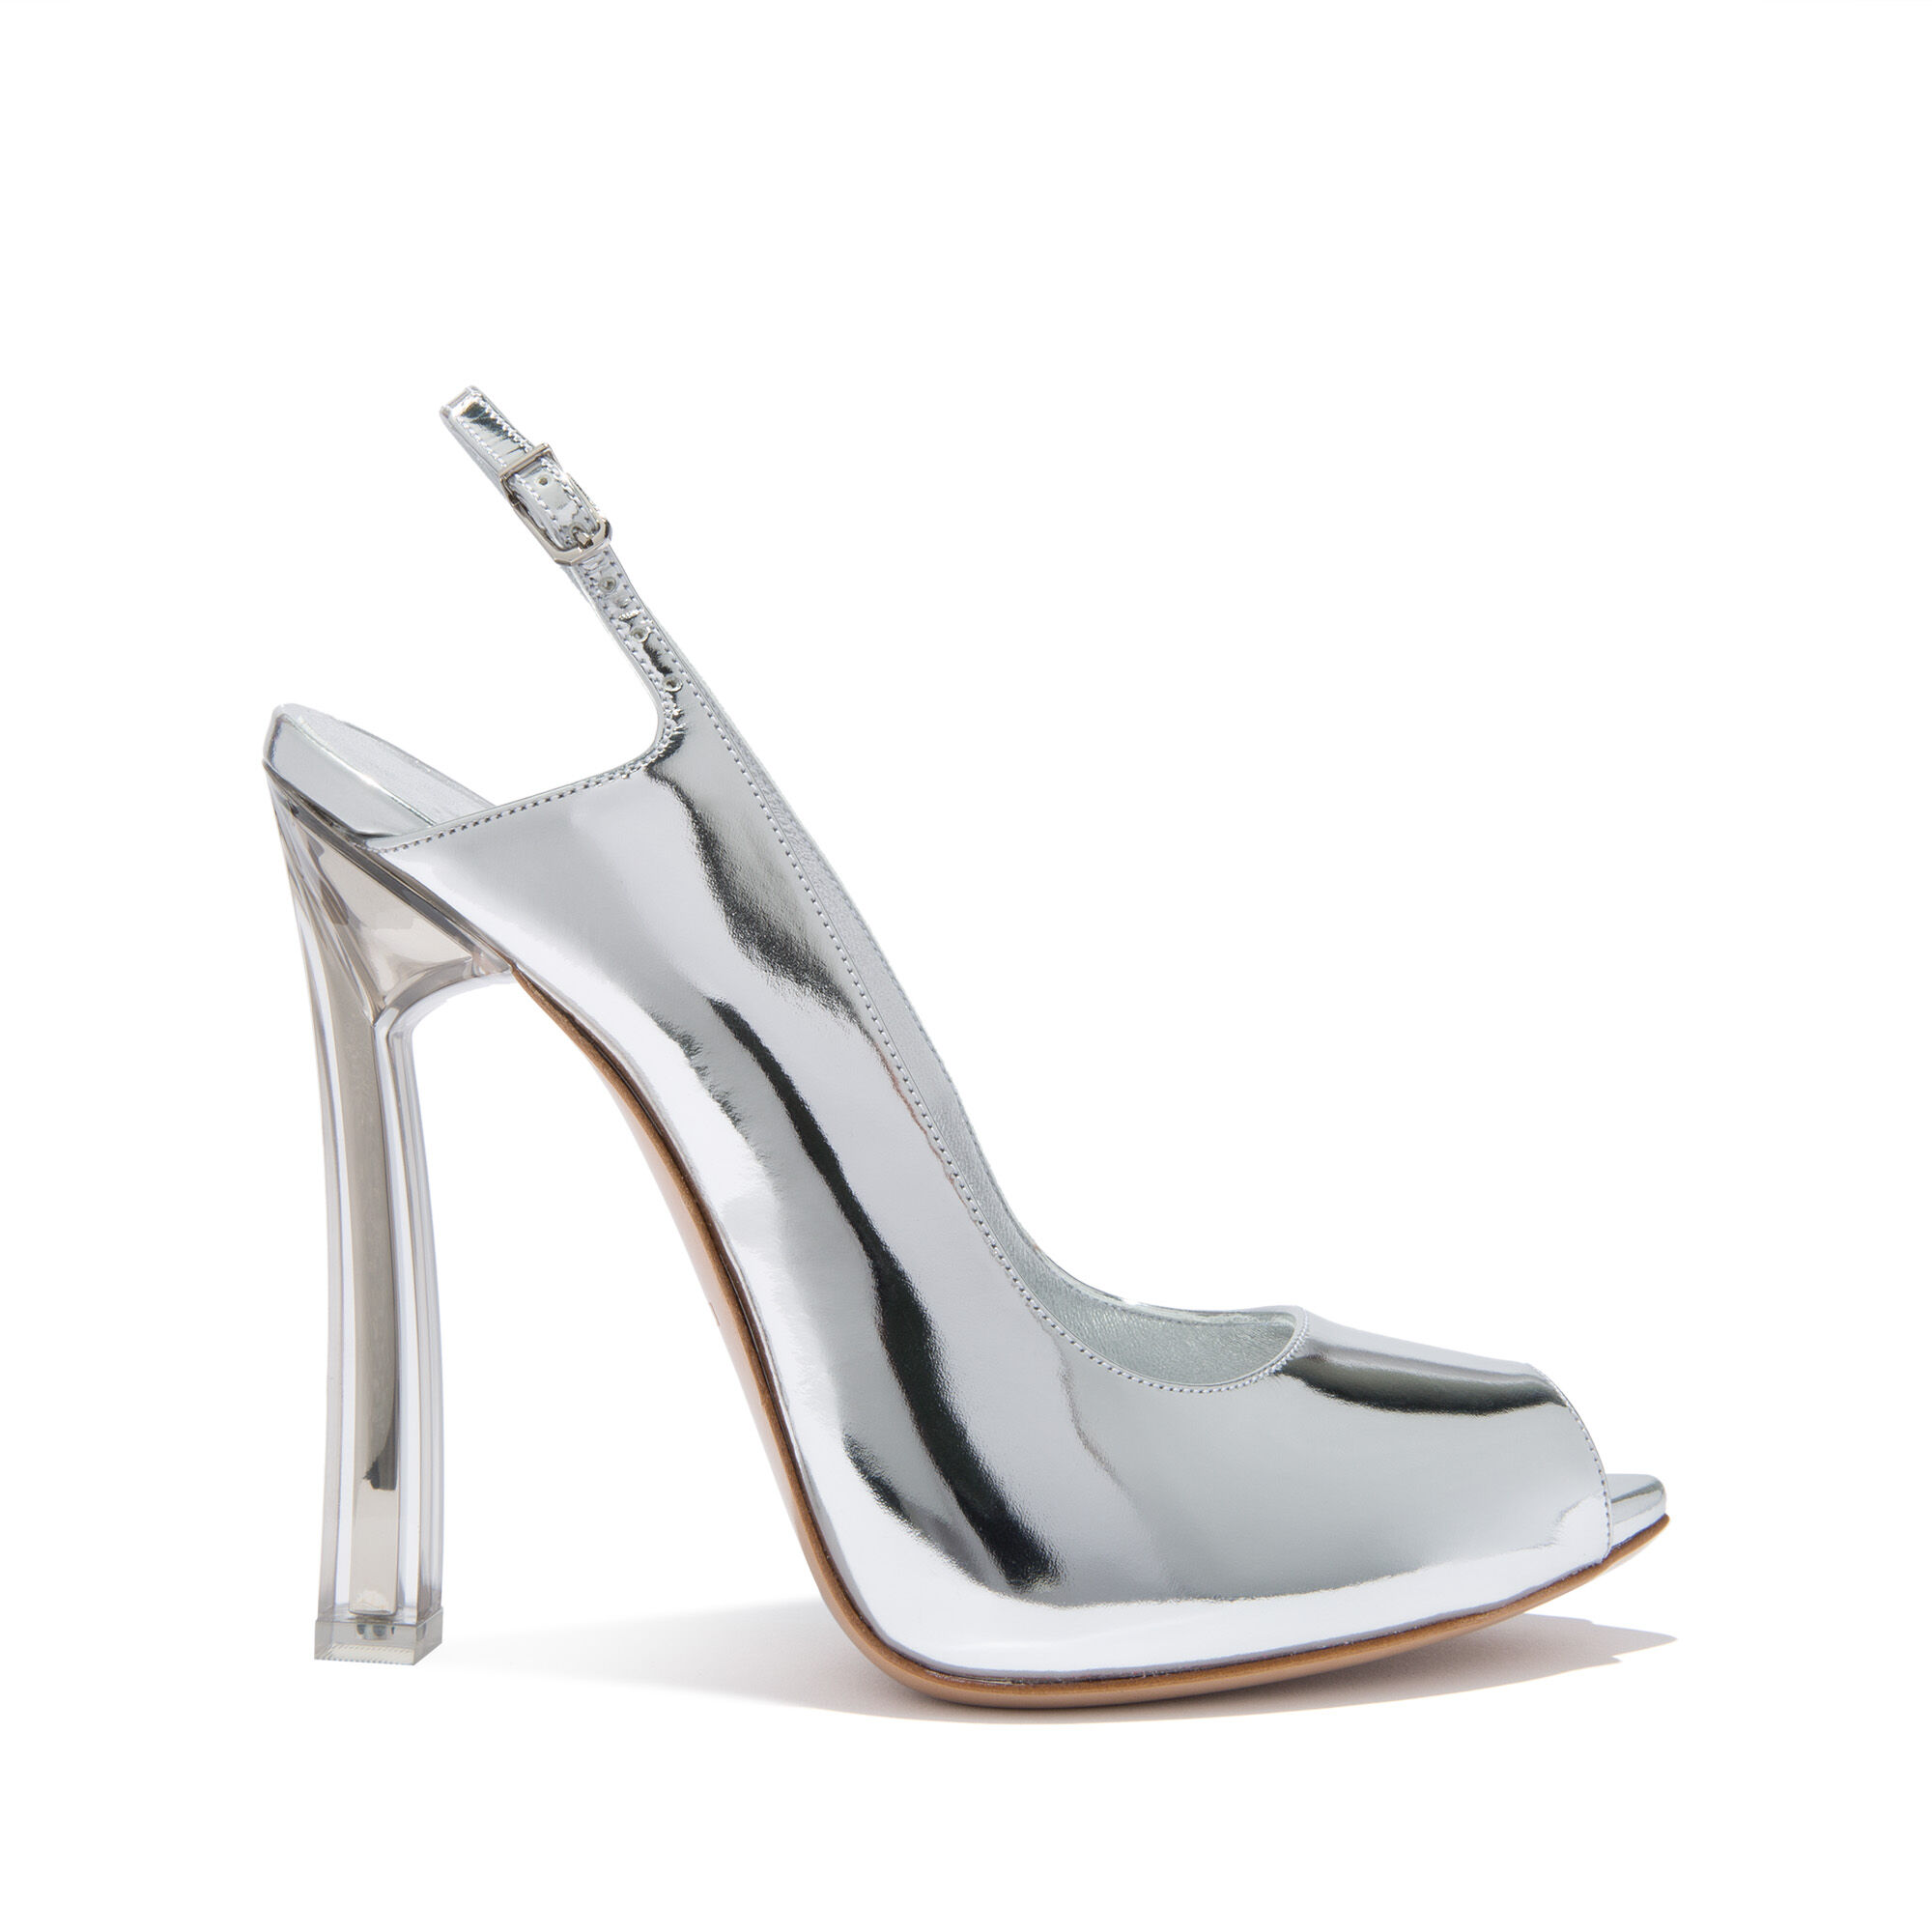 Chaussures Womens En Vente, Argent, Cuir, 2017, 36 37 38 39 38,5 Casadei